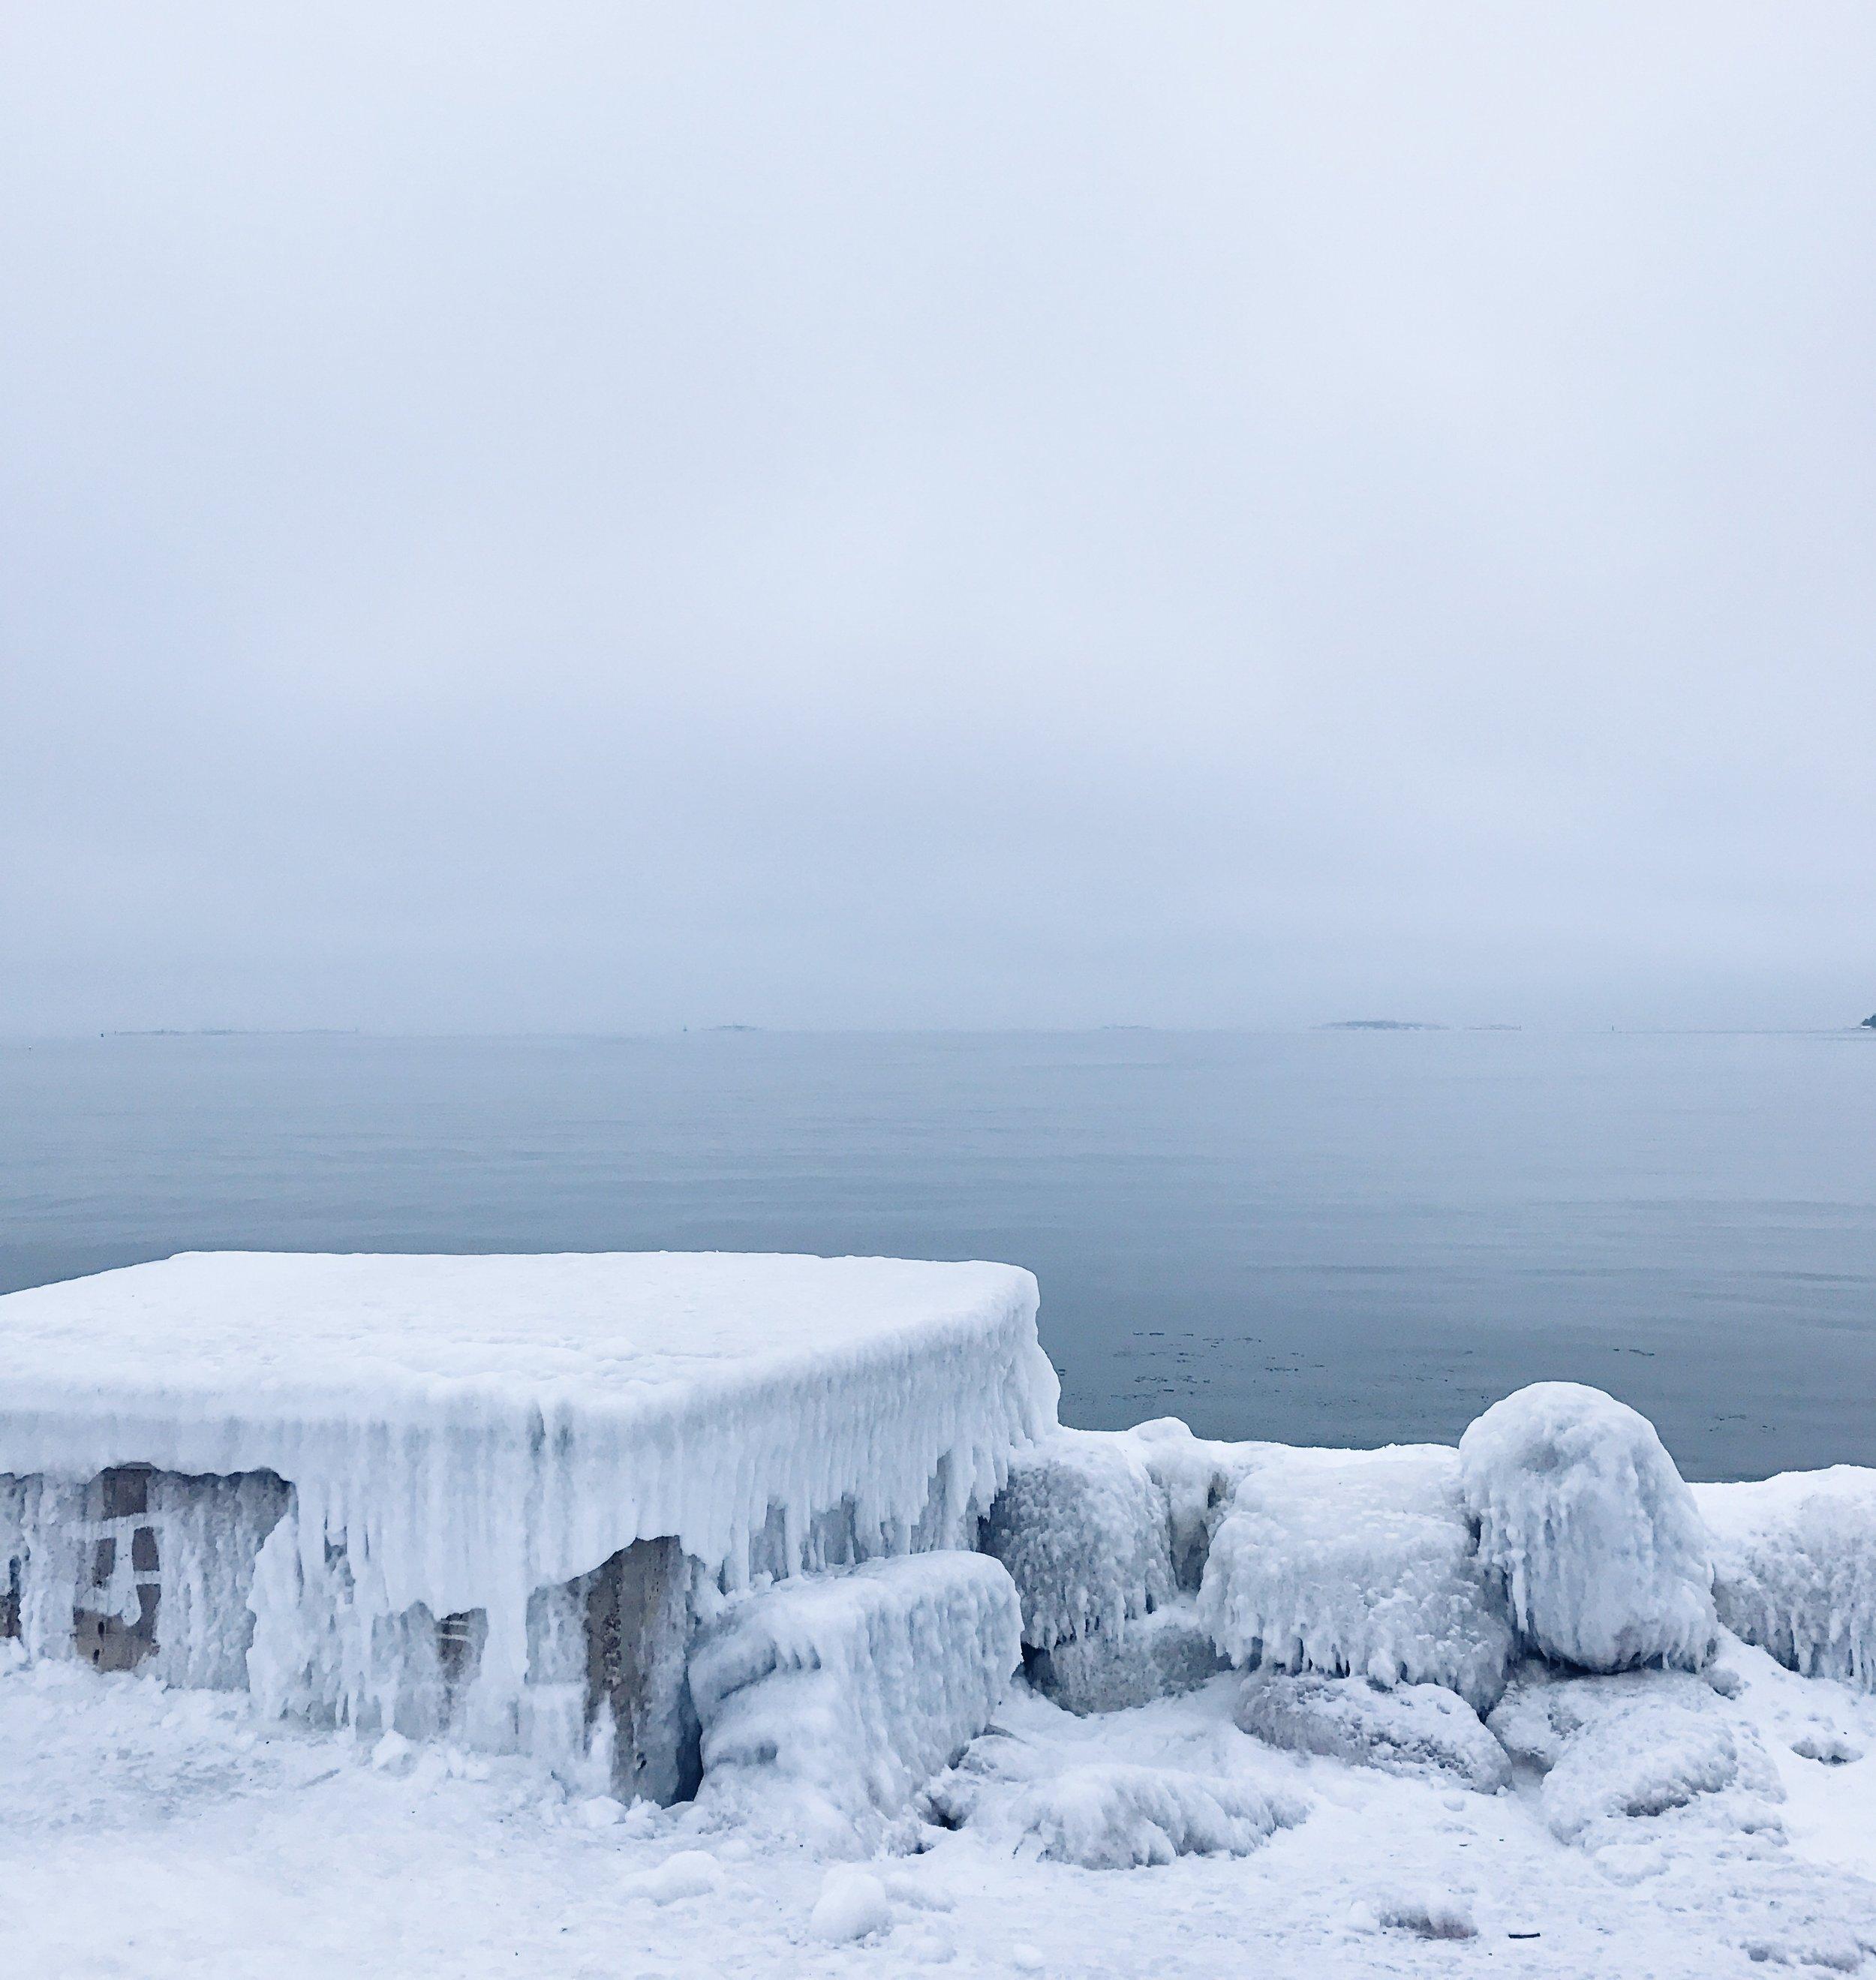 Eira, Helsinki Winter